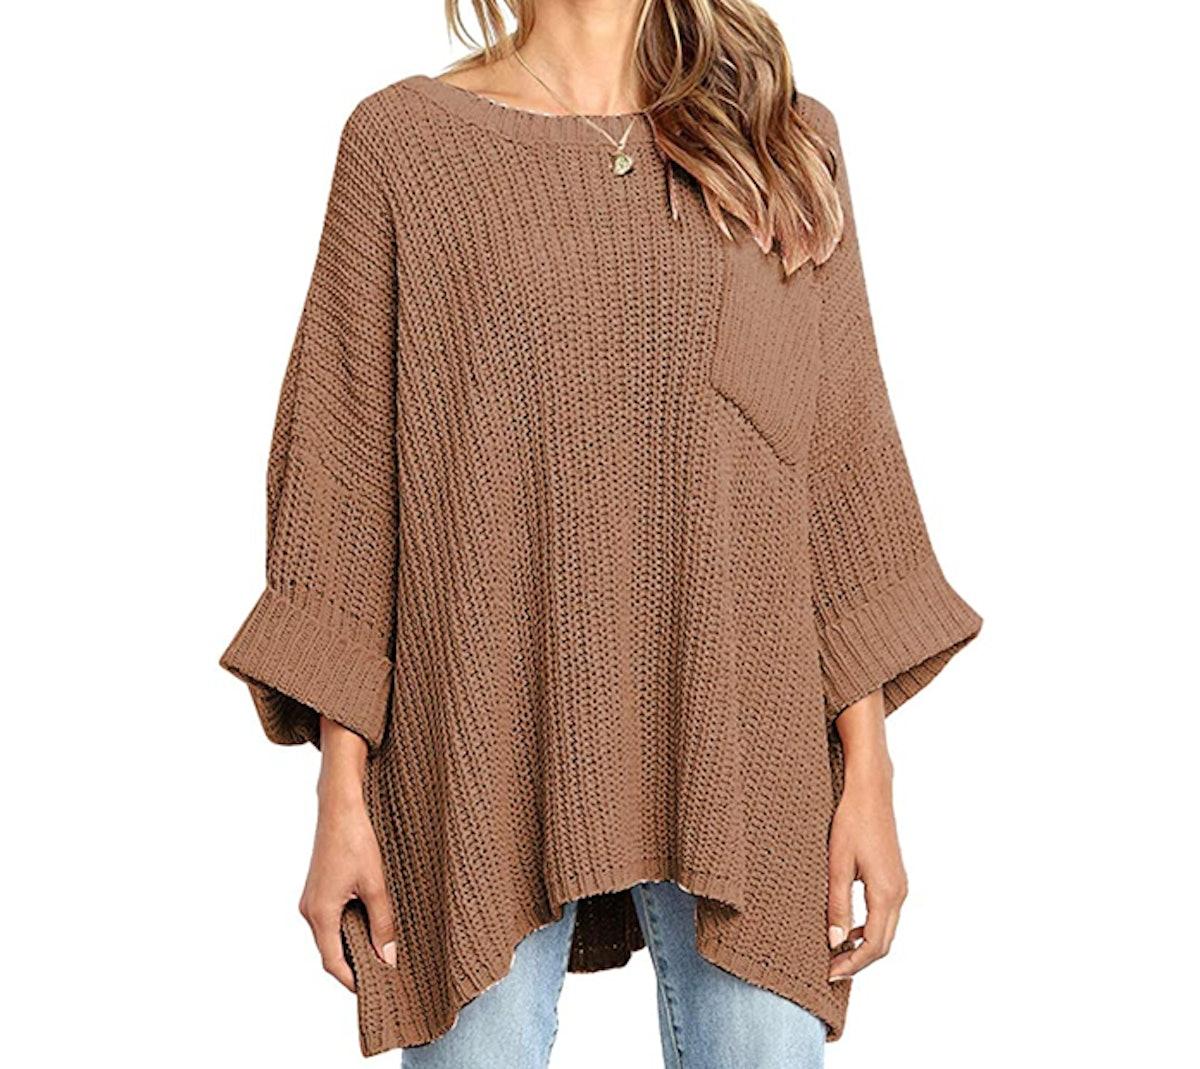 KIRUNDO Off-the-Shoulder Knit Sweater